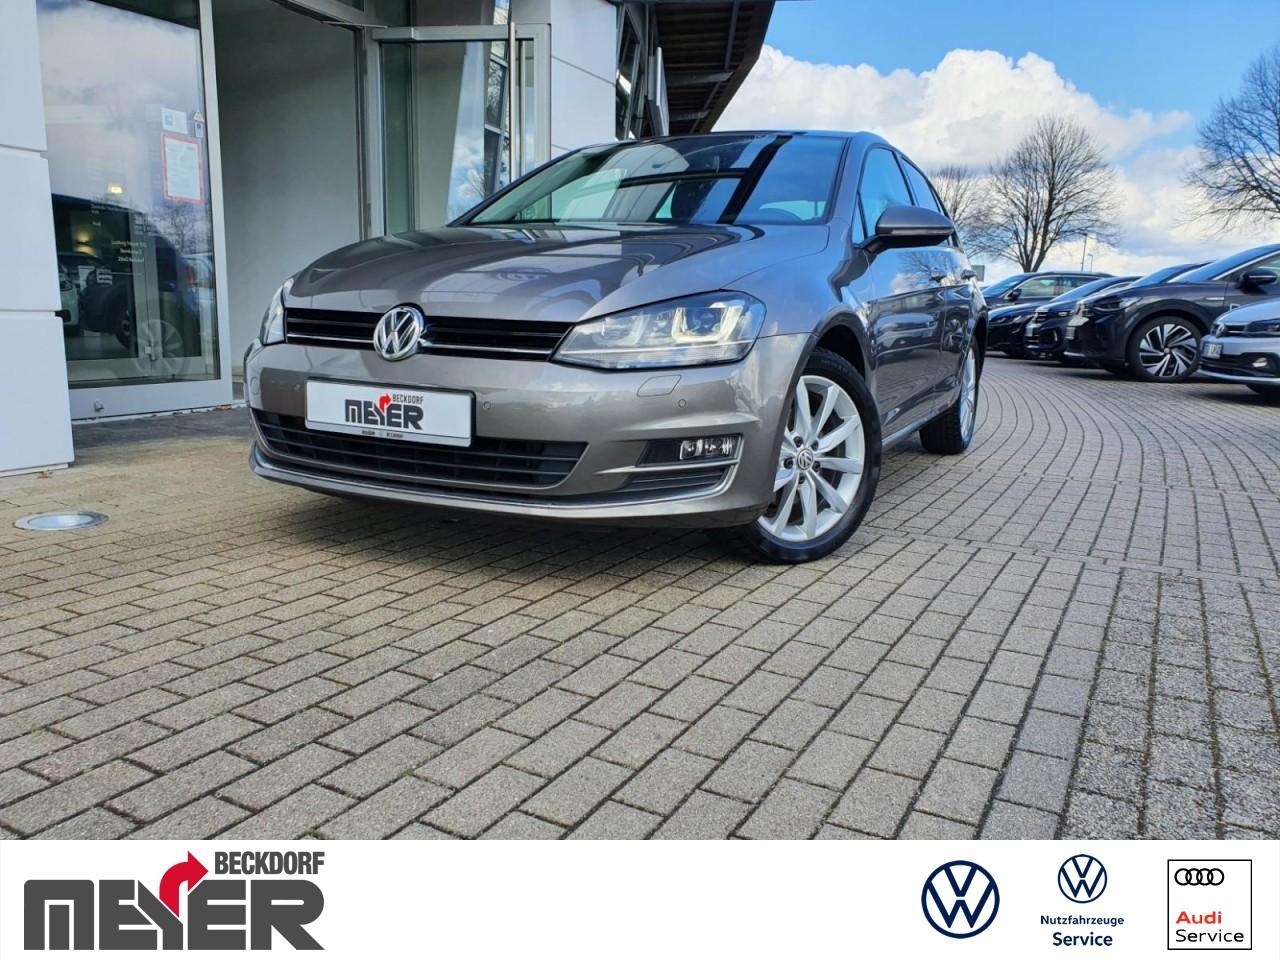 Volkswagen Golf Highline 1.4 TSI Klima Xenon Einparkhilfe, Jahr 2014, Benzin